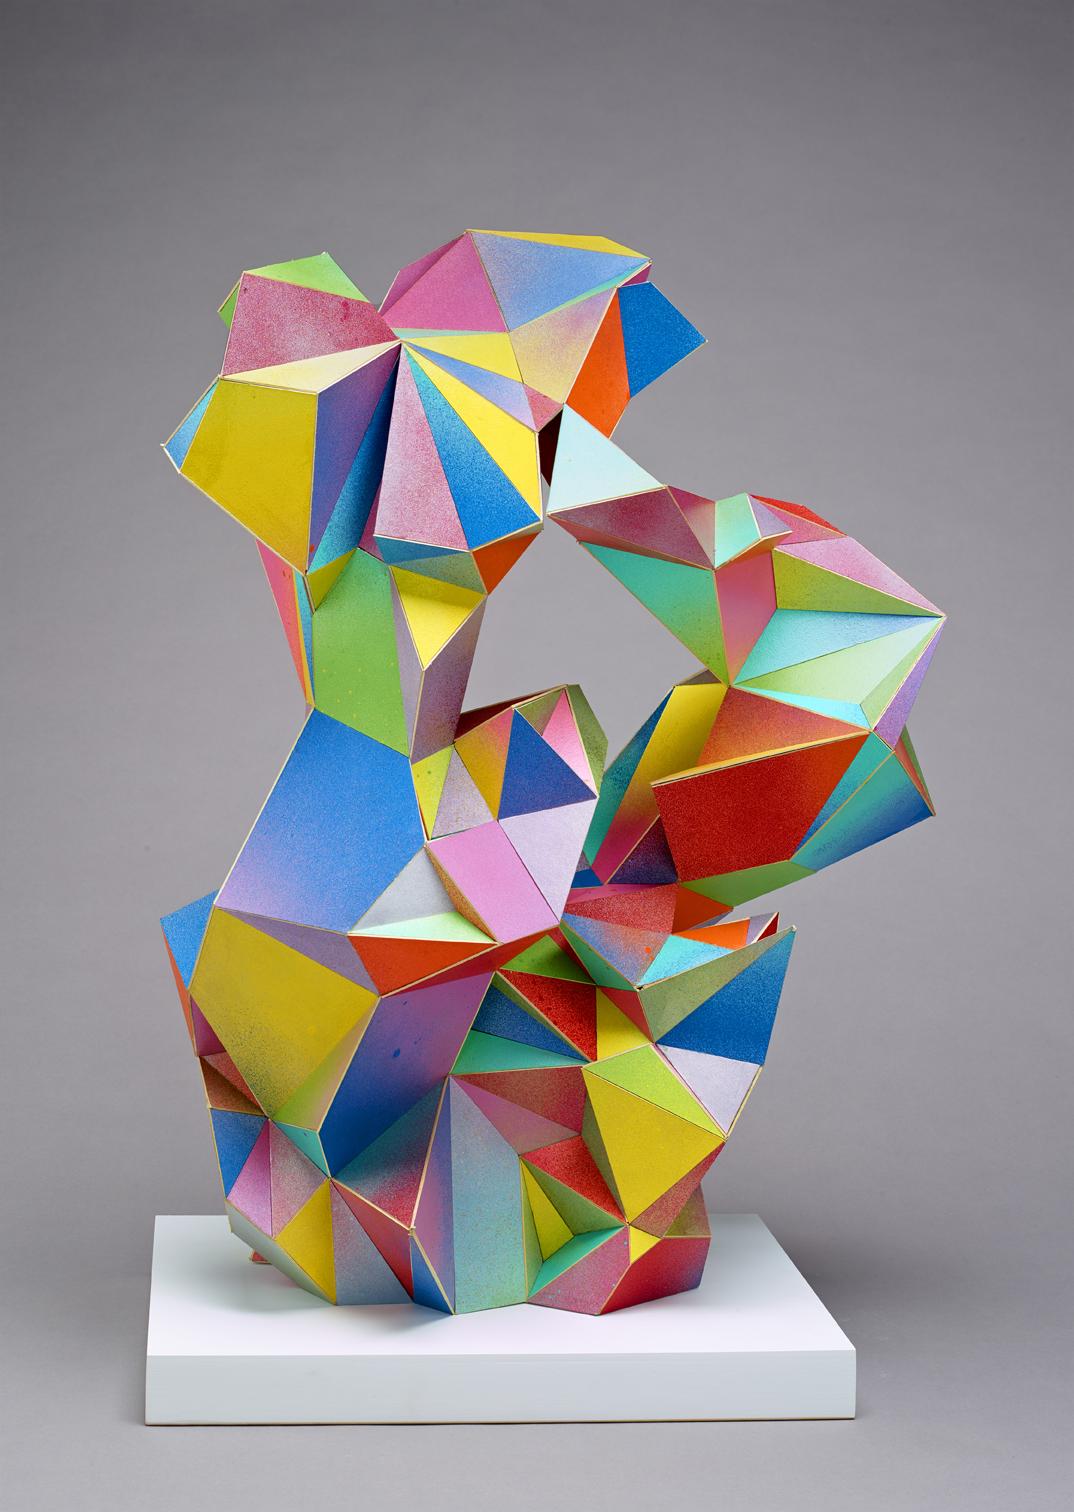 16_02_27_Jud_Bergeron_Sculpture29708_work_02.jpg